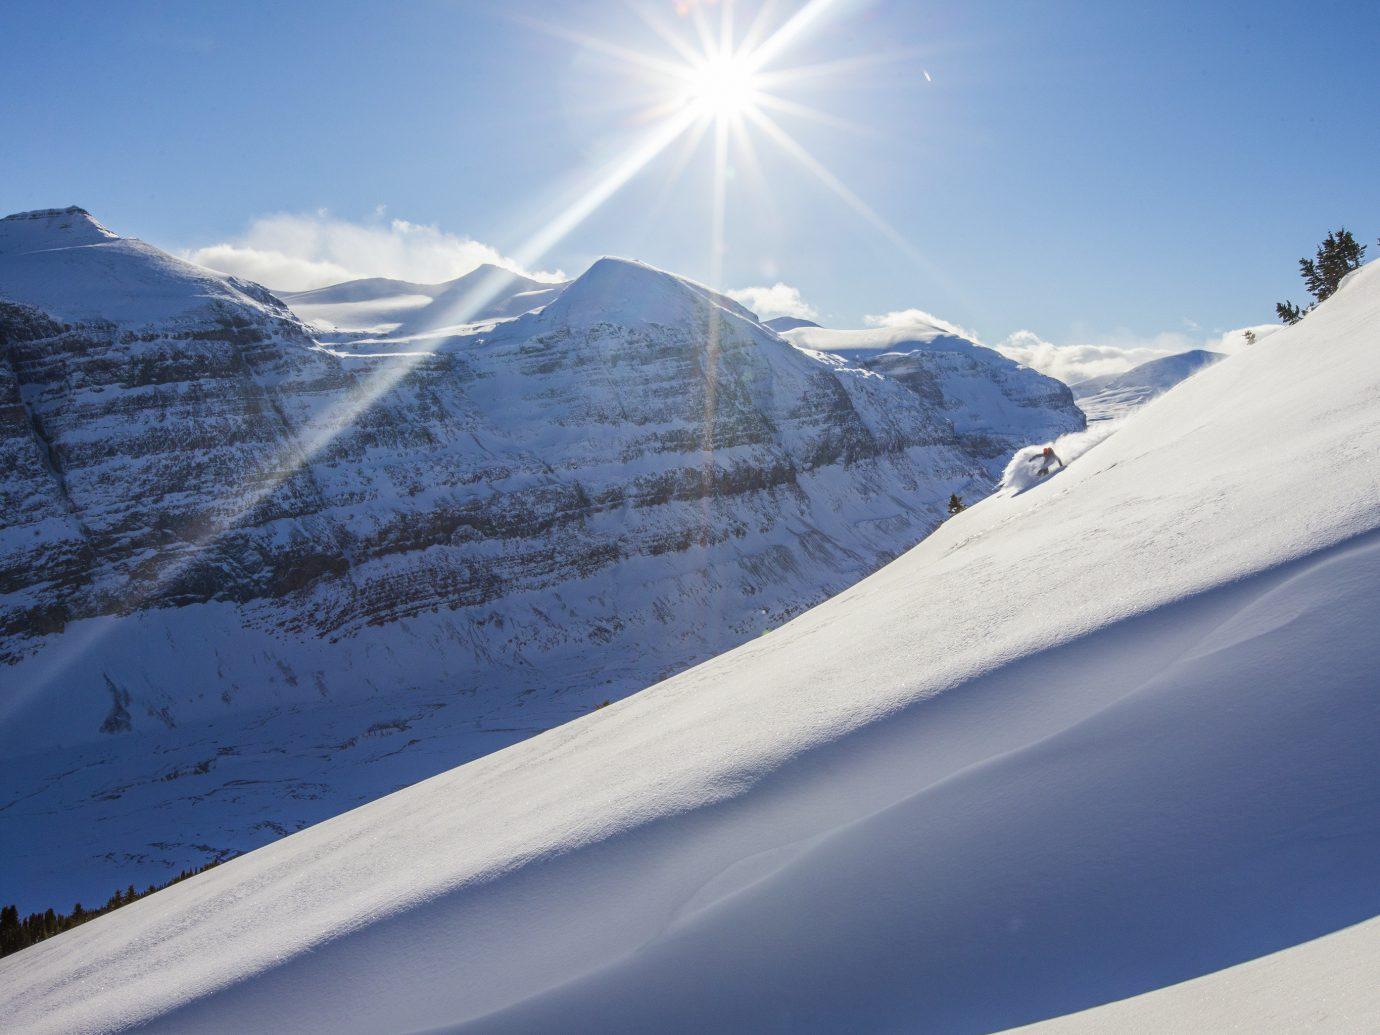 Ski slope on Mt. Norquay